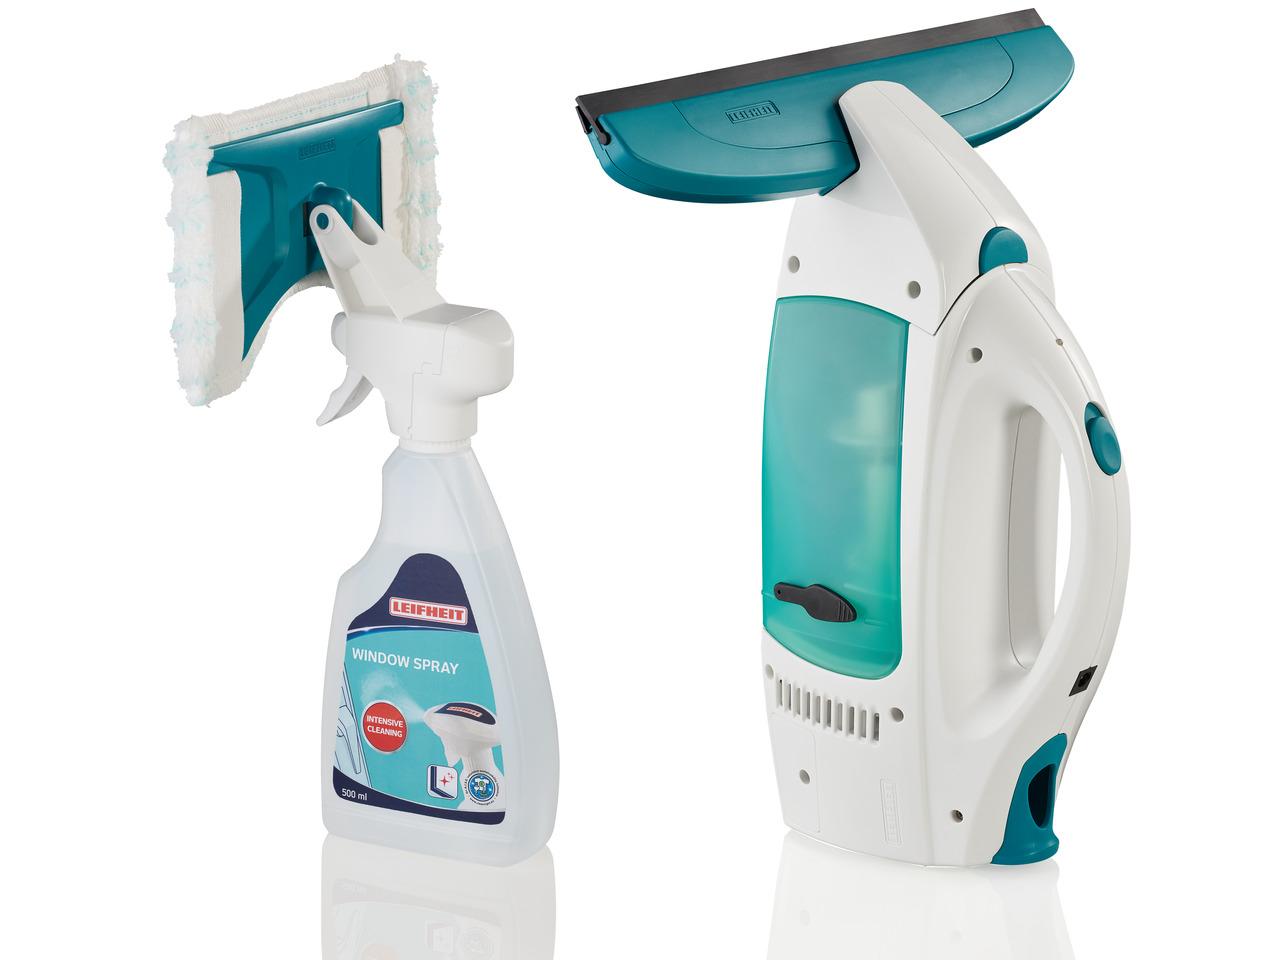 LEIFHEIT Vysavač na okna Window Cleaner a mop na okna Micro Duo s čističem na sklo LEIFHEIT 51021